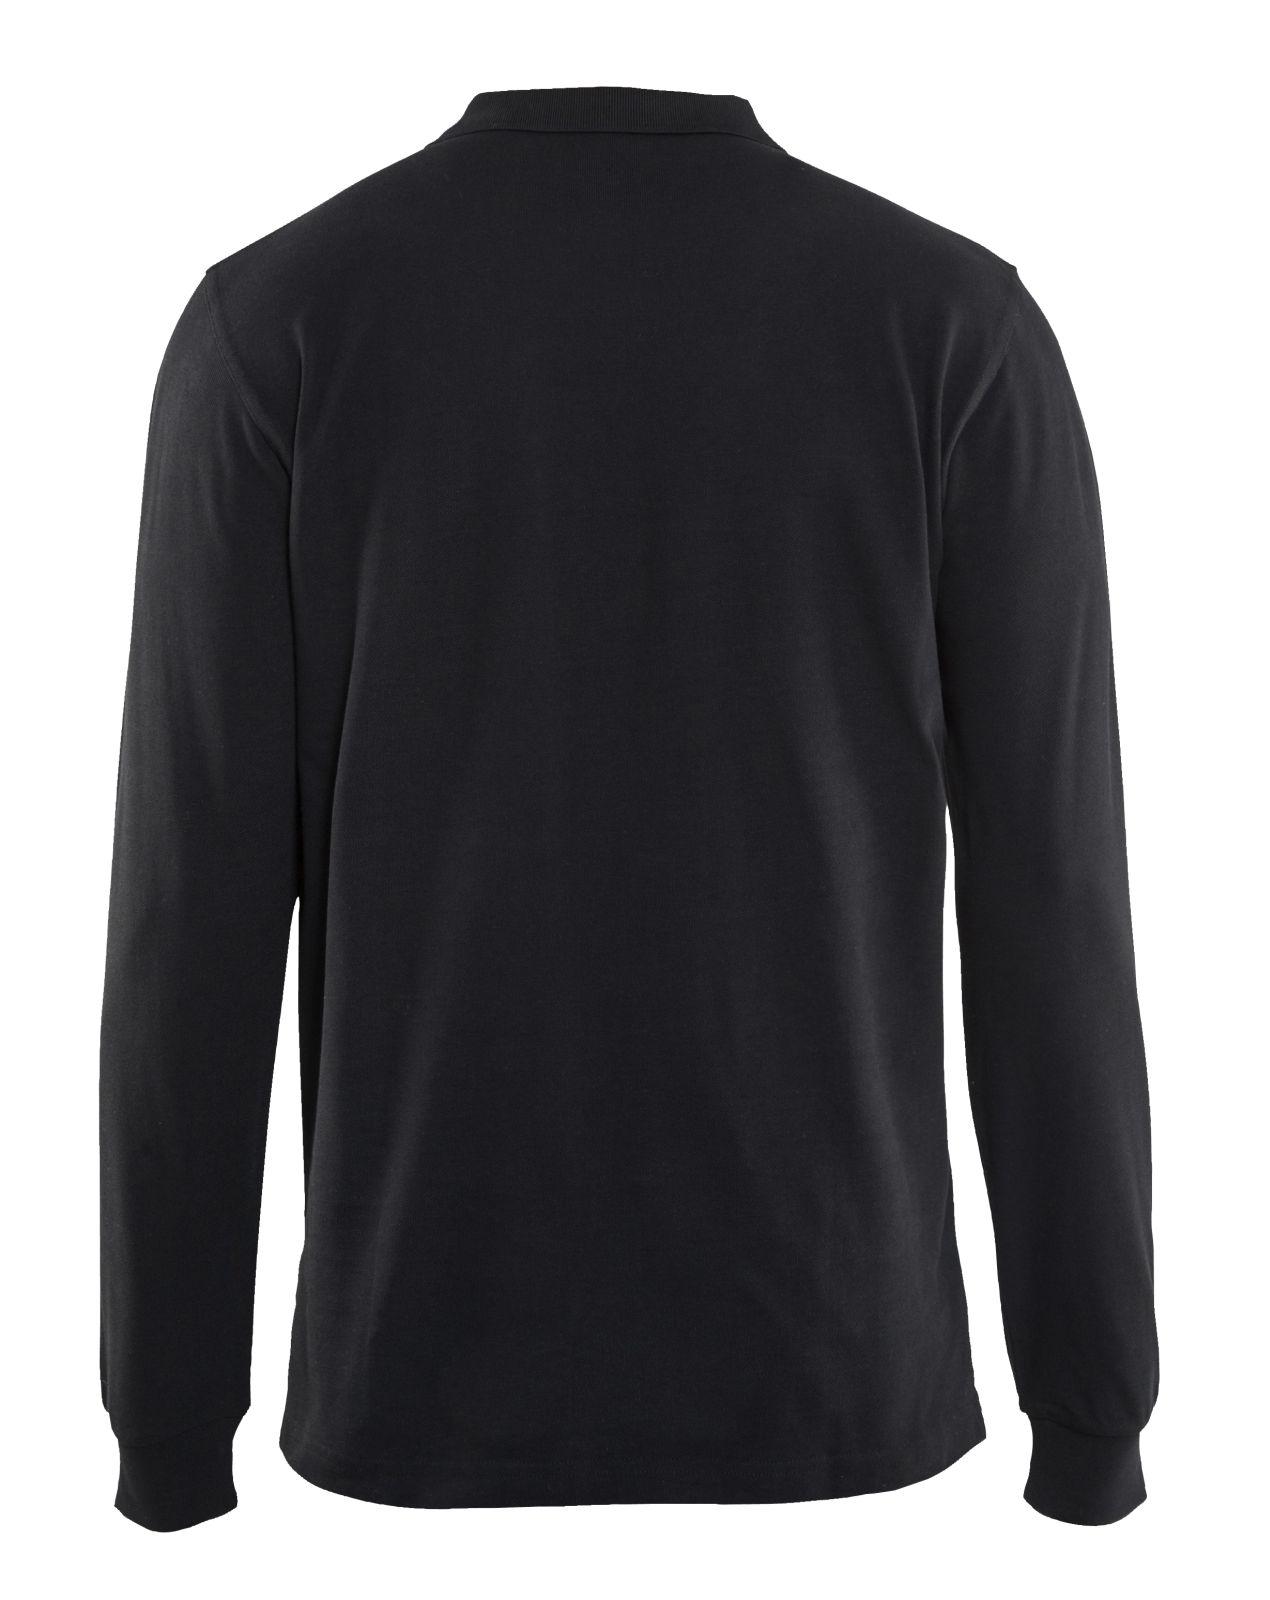 Blaklader Poloshirts 33881050 zwart(9900)